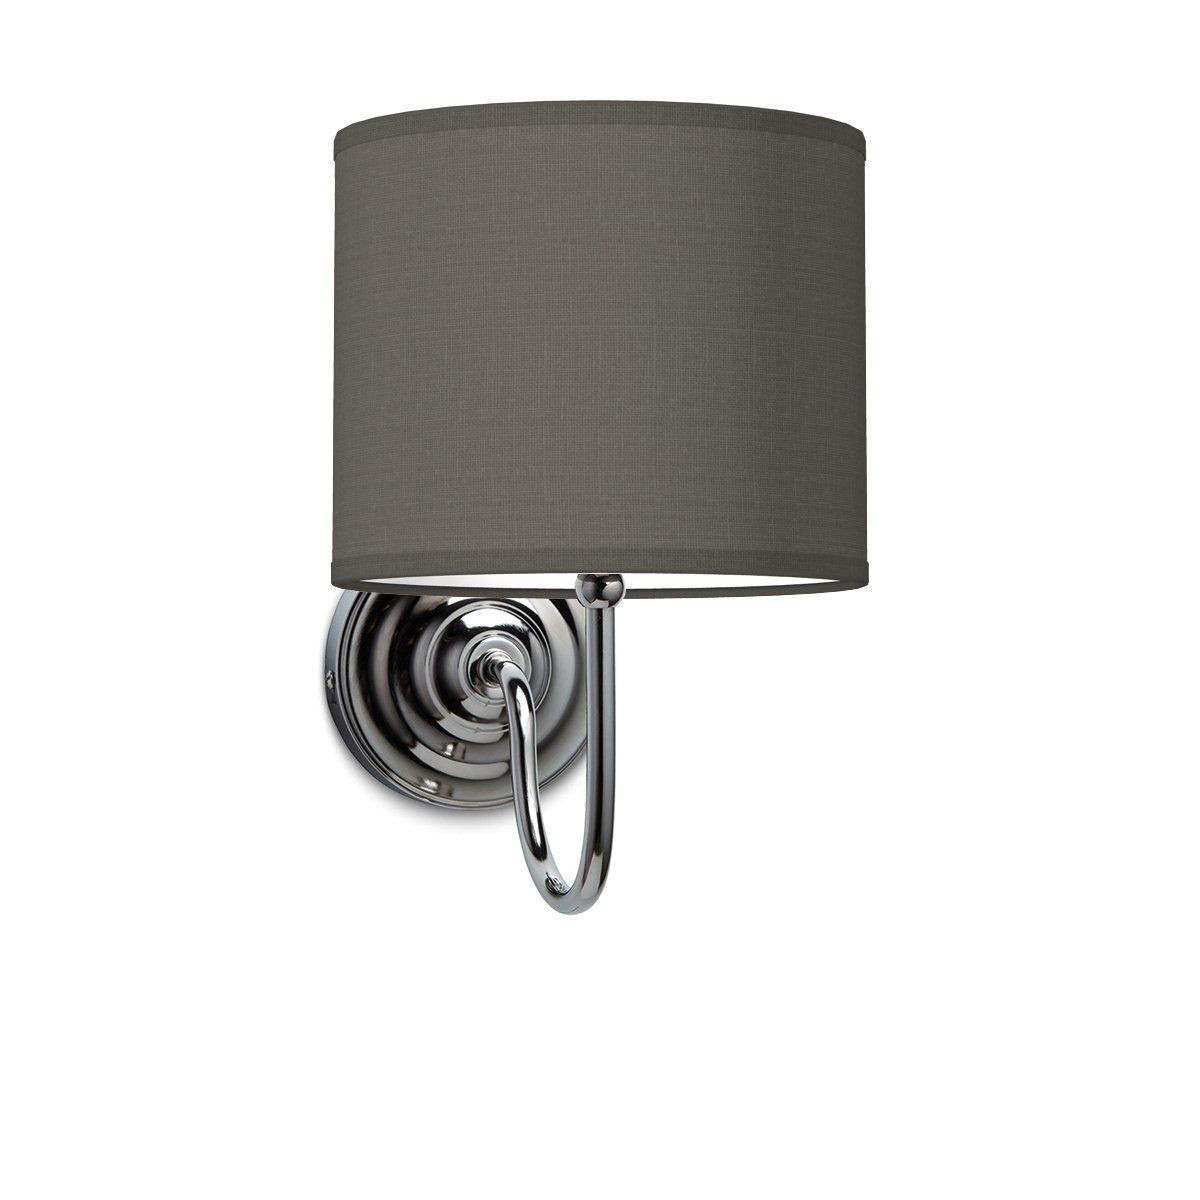 Wandlamp lilly bling Ø 20 cm - antraciet